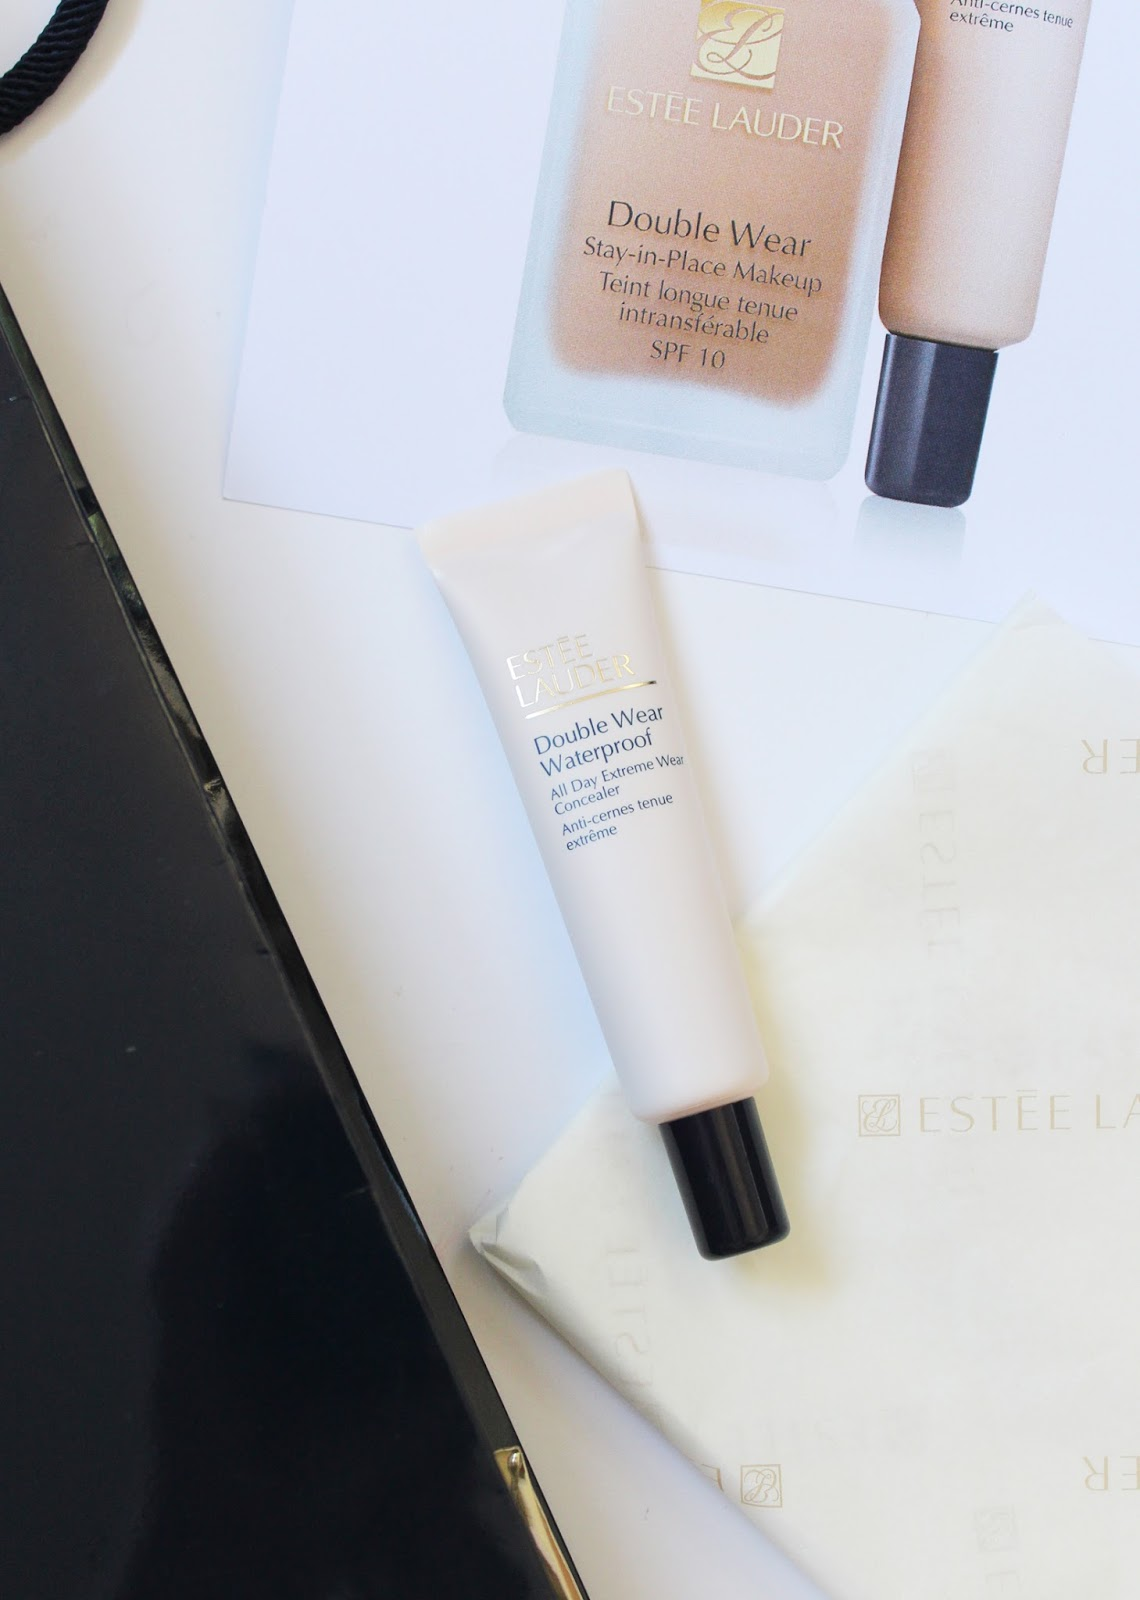 ESTEE LAUDER | New Product Launches Overview - Double Wear Waterprood Concealer - CassandraMyee